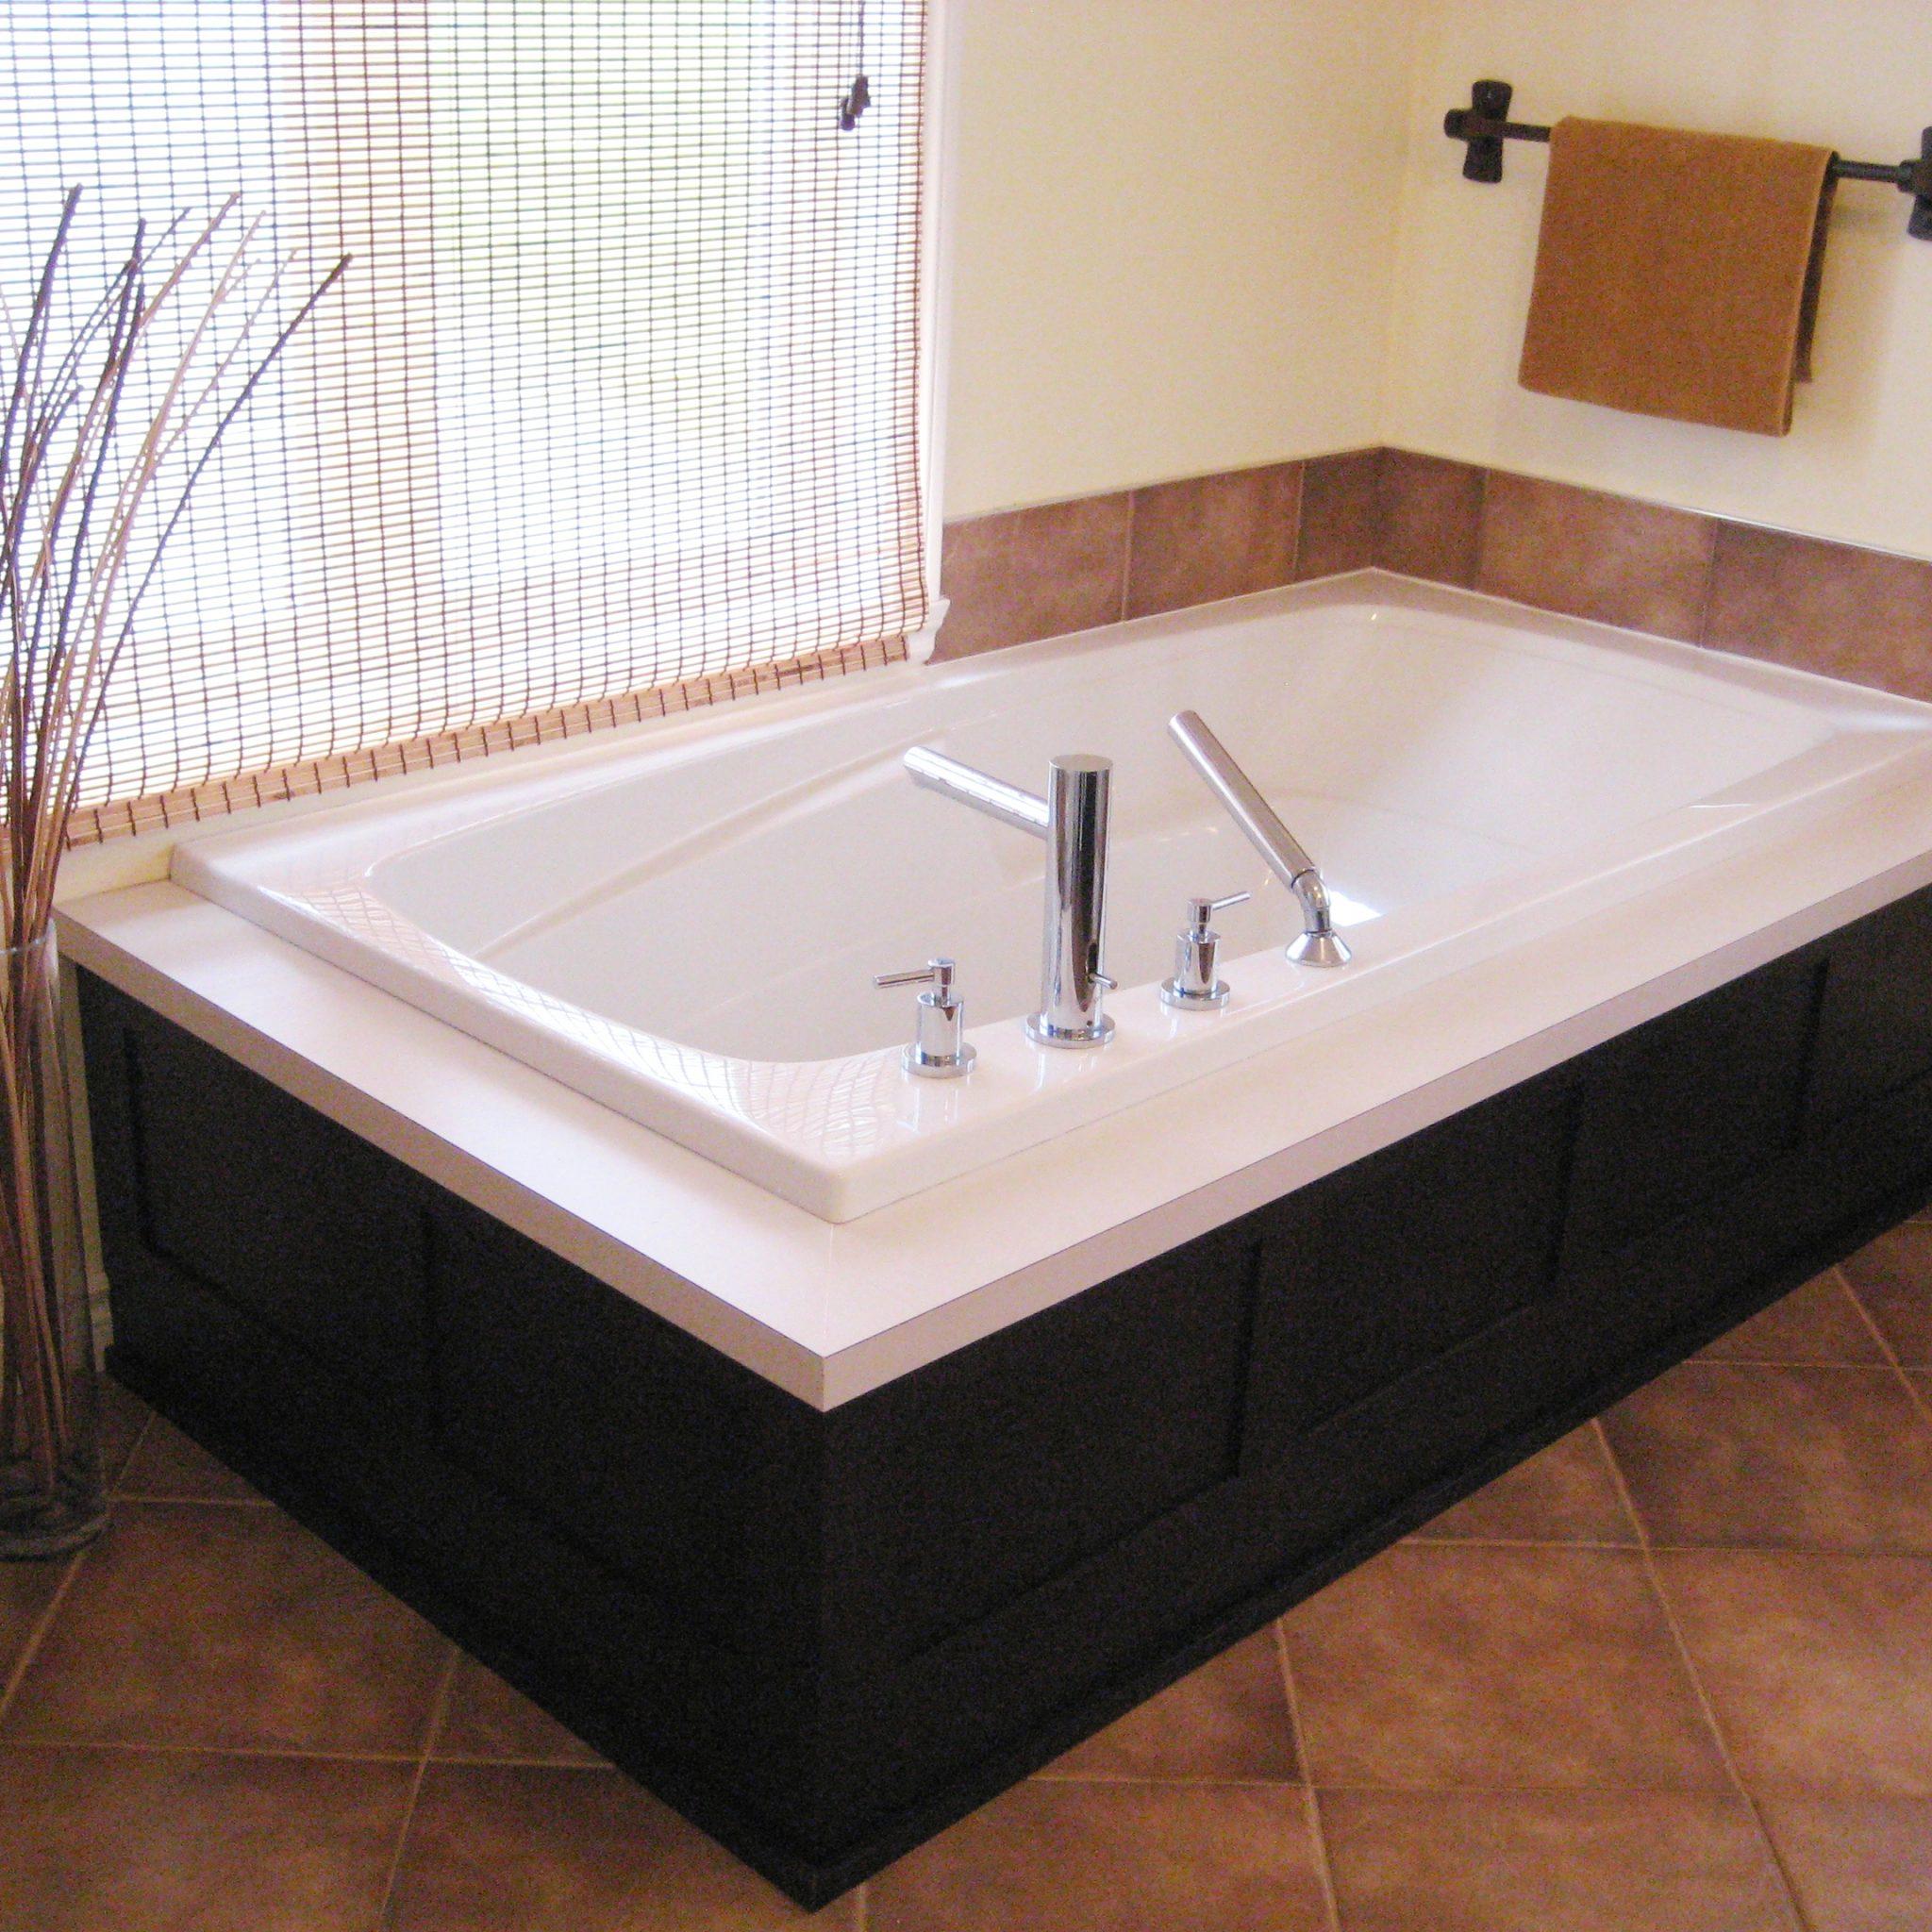 Salle de bain proj ex millwork - Modification salle de bain ...